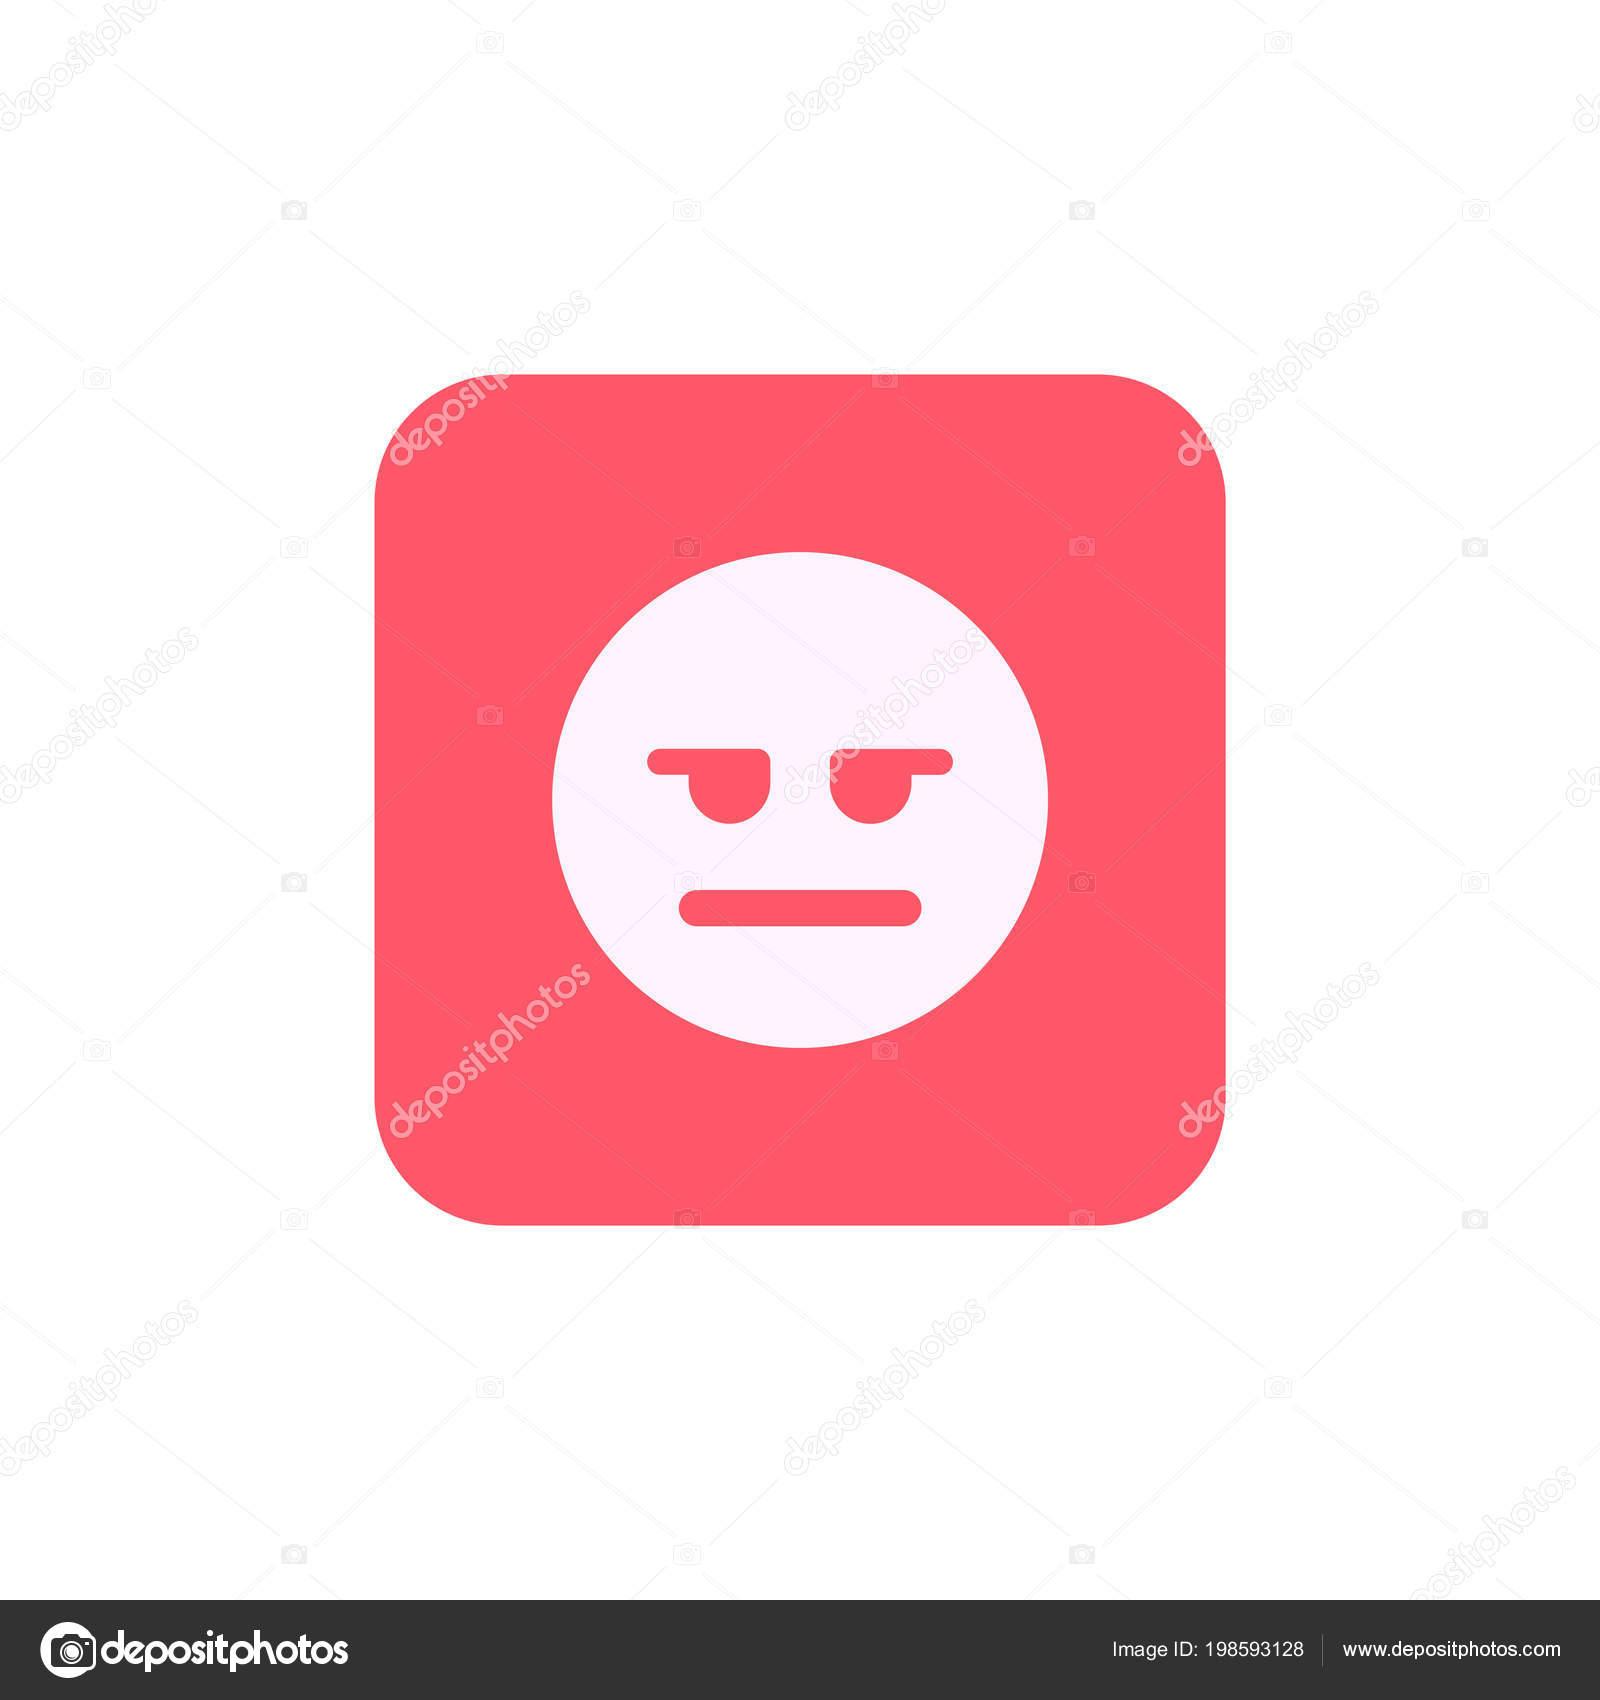 Impatient emoji